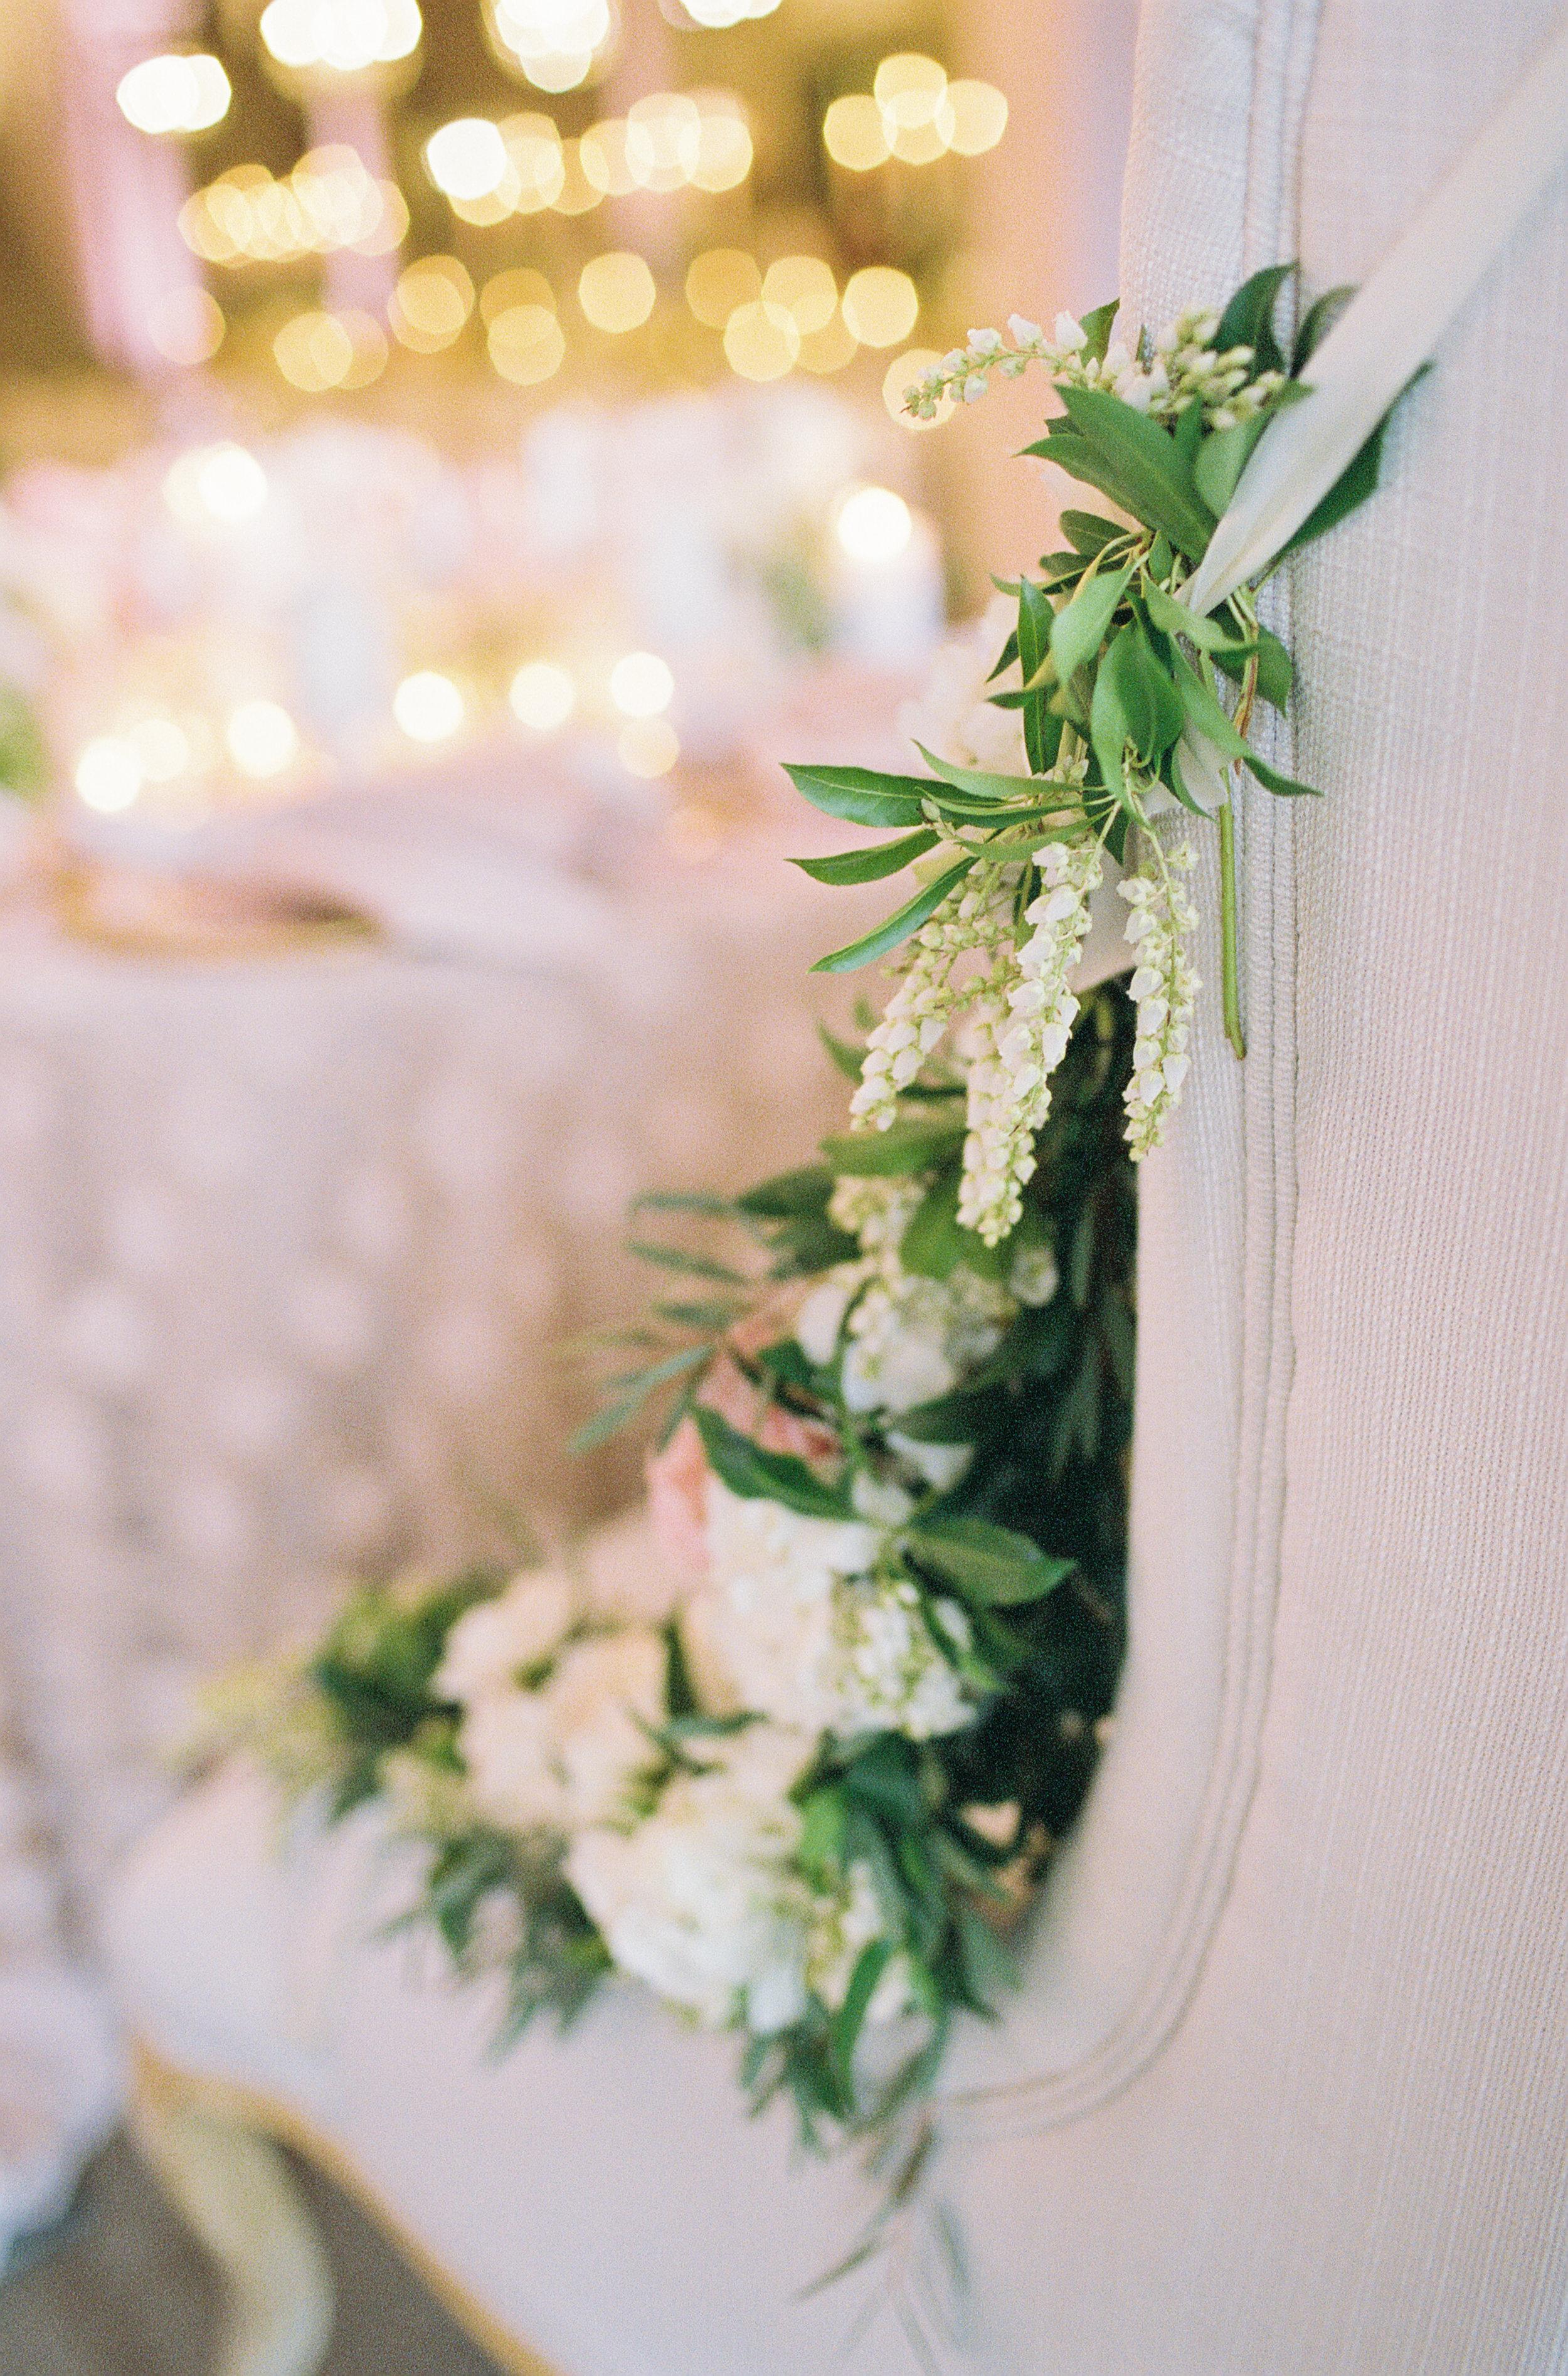 Athenaeum_Wedding_Hi_Res-99-Jen_Huang-005180-R1-007.jpg